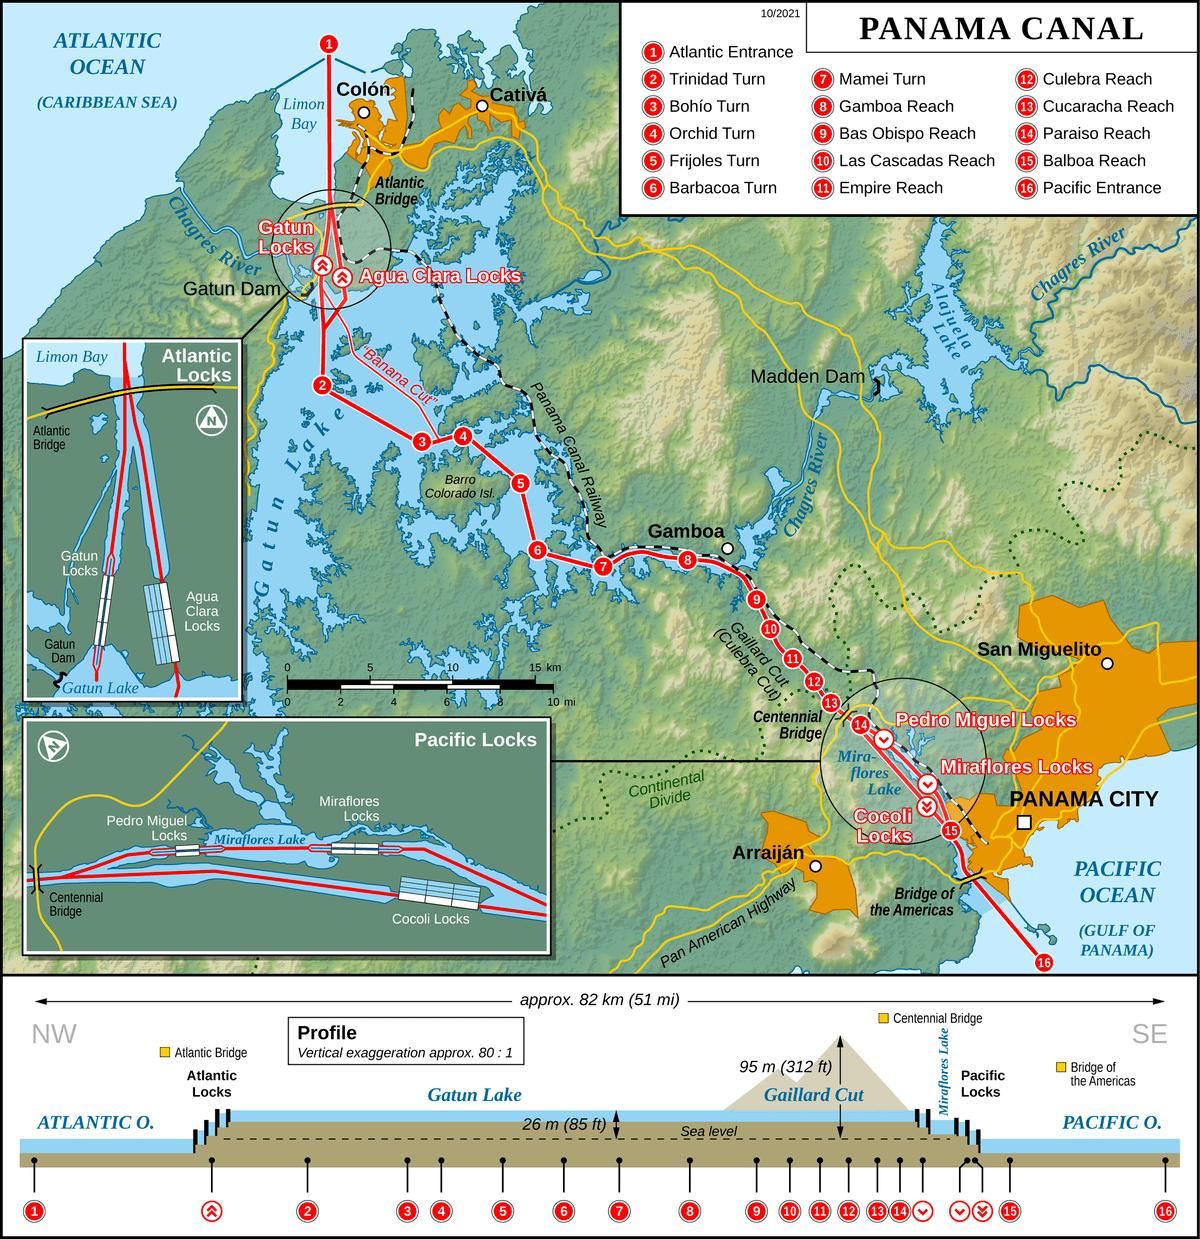 carnival cruise ship diagram 3 phase submersible pump control panel wiring panama canal - wikipedia